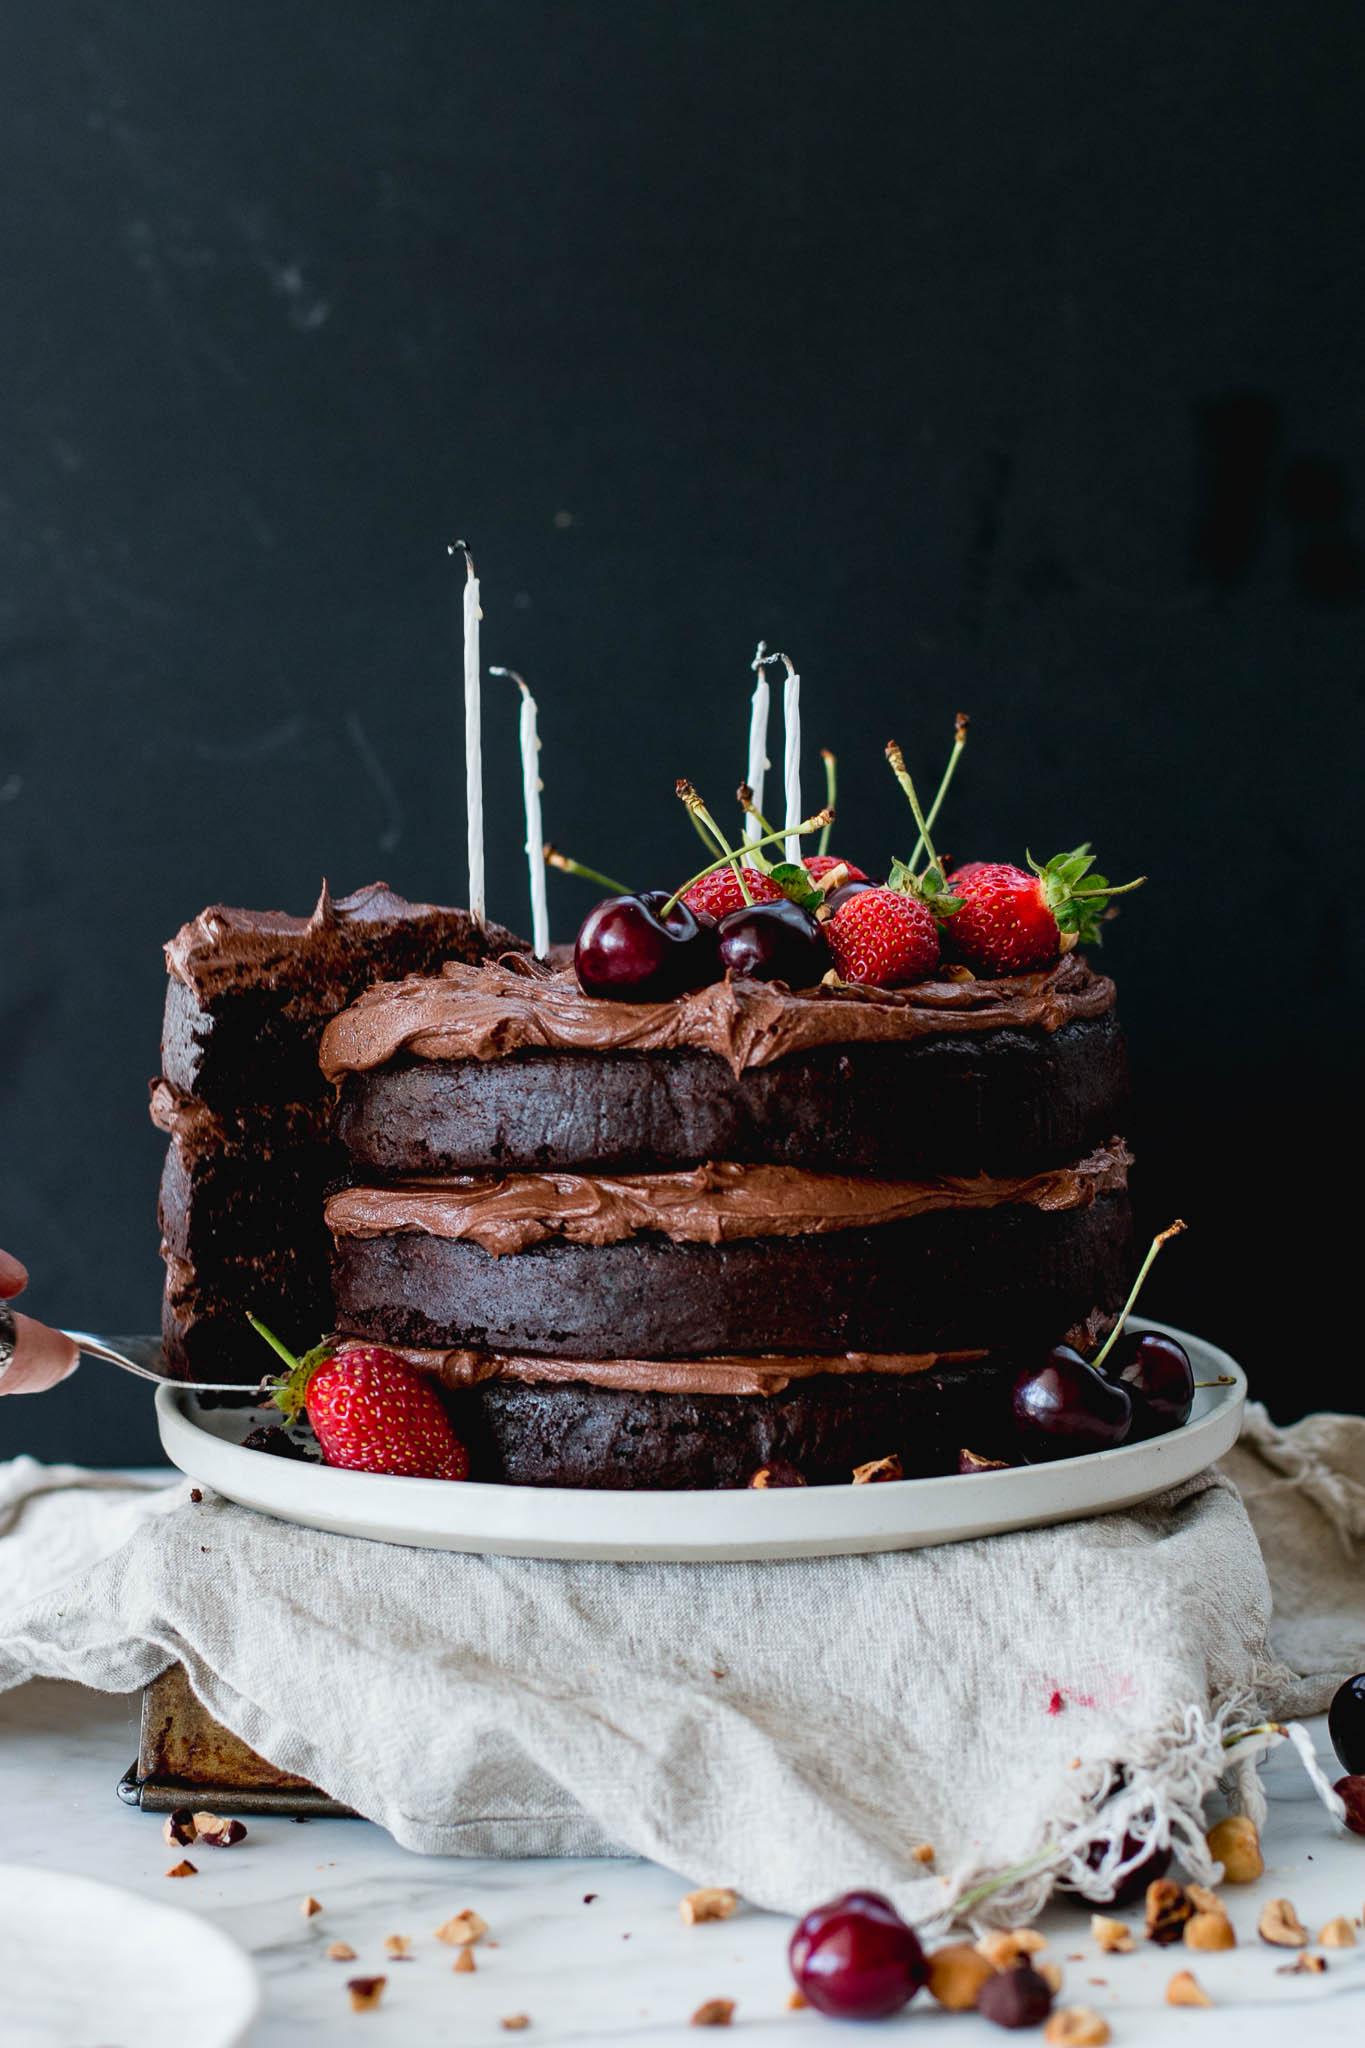 My Cafe Chocolate Cake With Hazelnuts : chocolate, hazelnuts, Flourless, Chocolate, Hazelnut, Layer, Brick, Kitchen